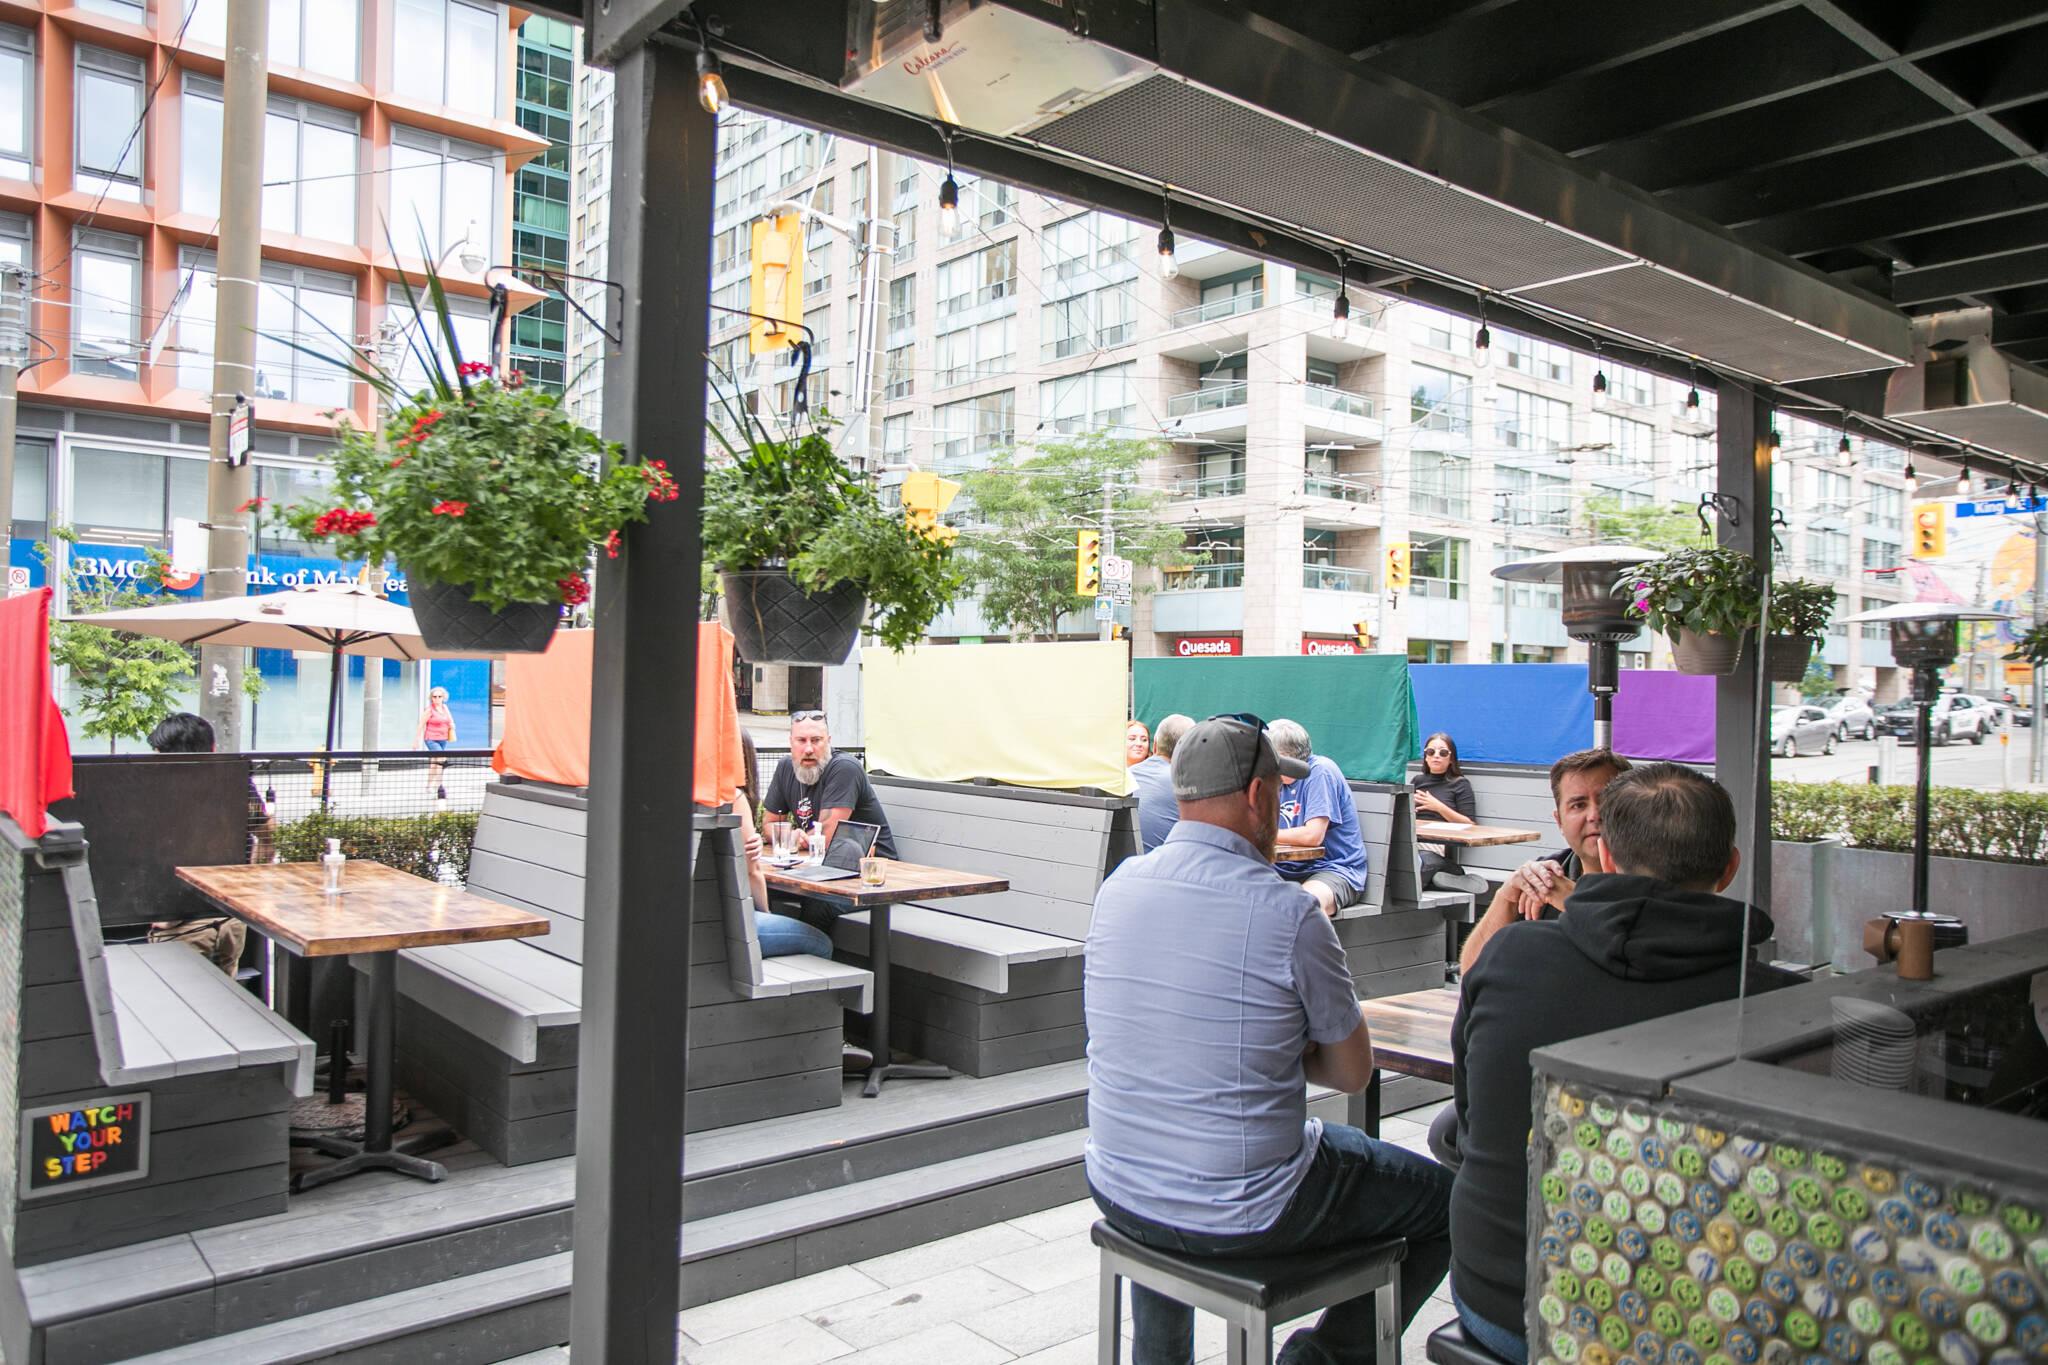 patios open toronto